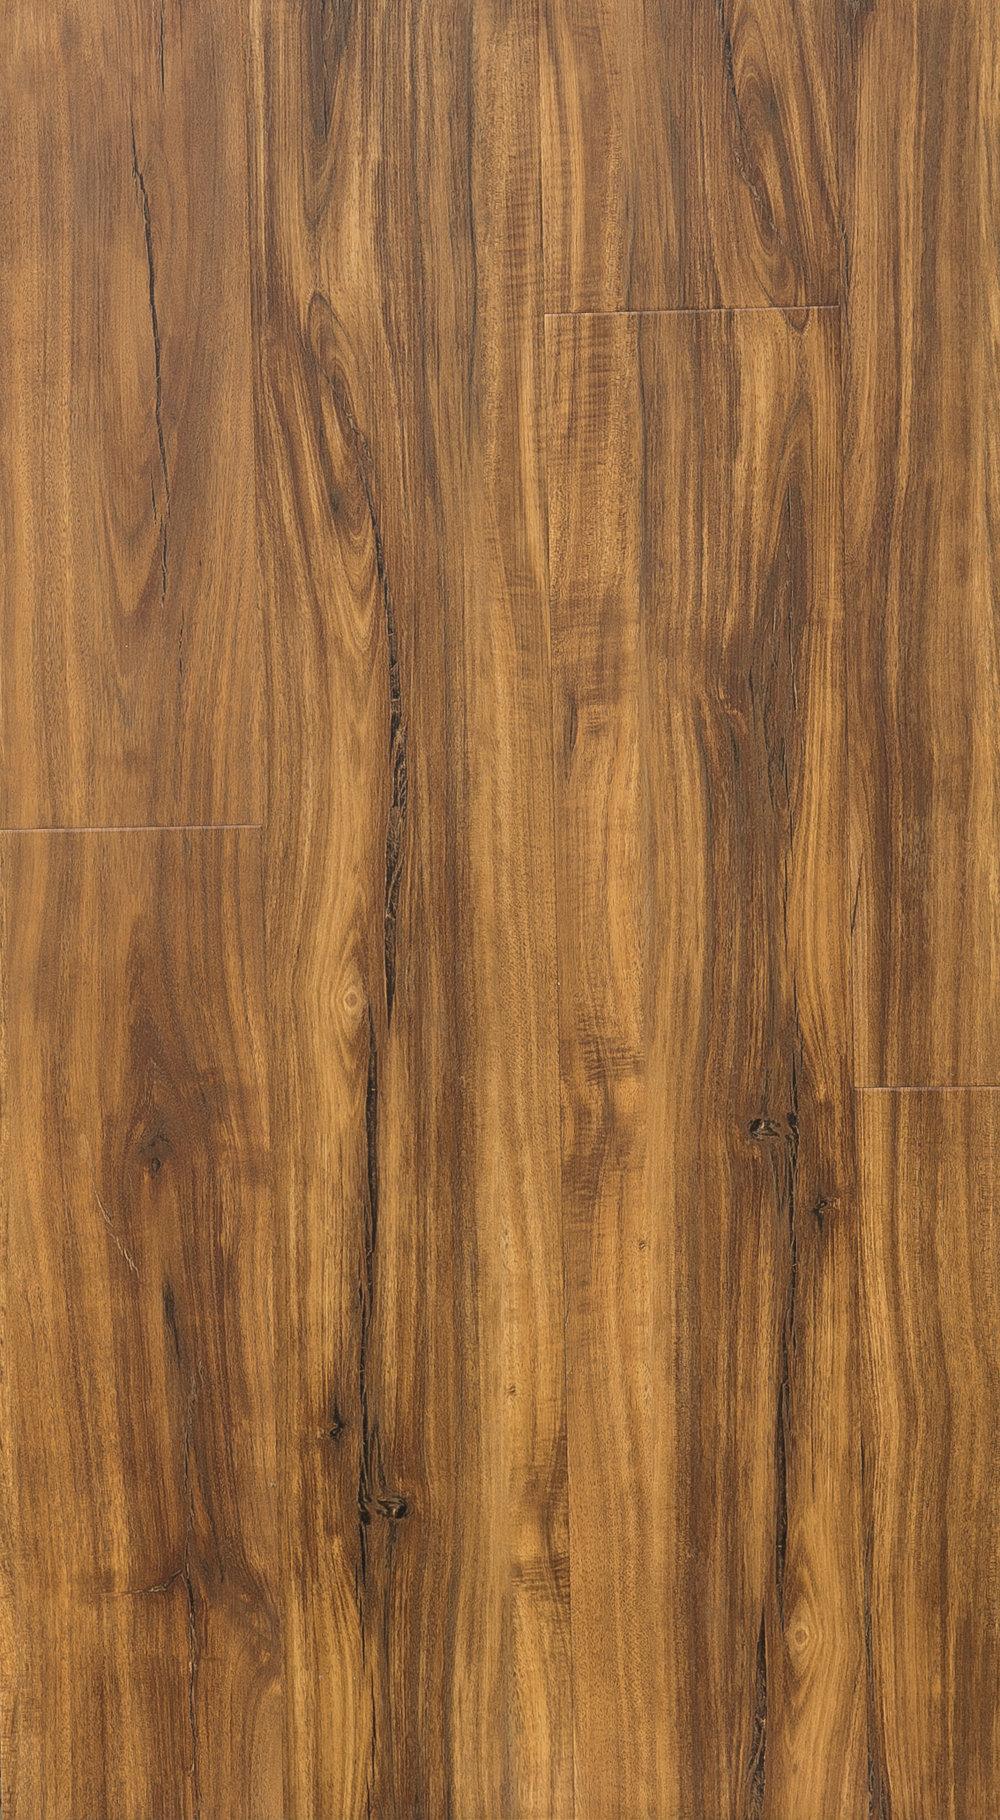 W5011 - Acacia Rustic